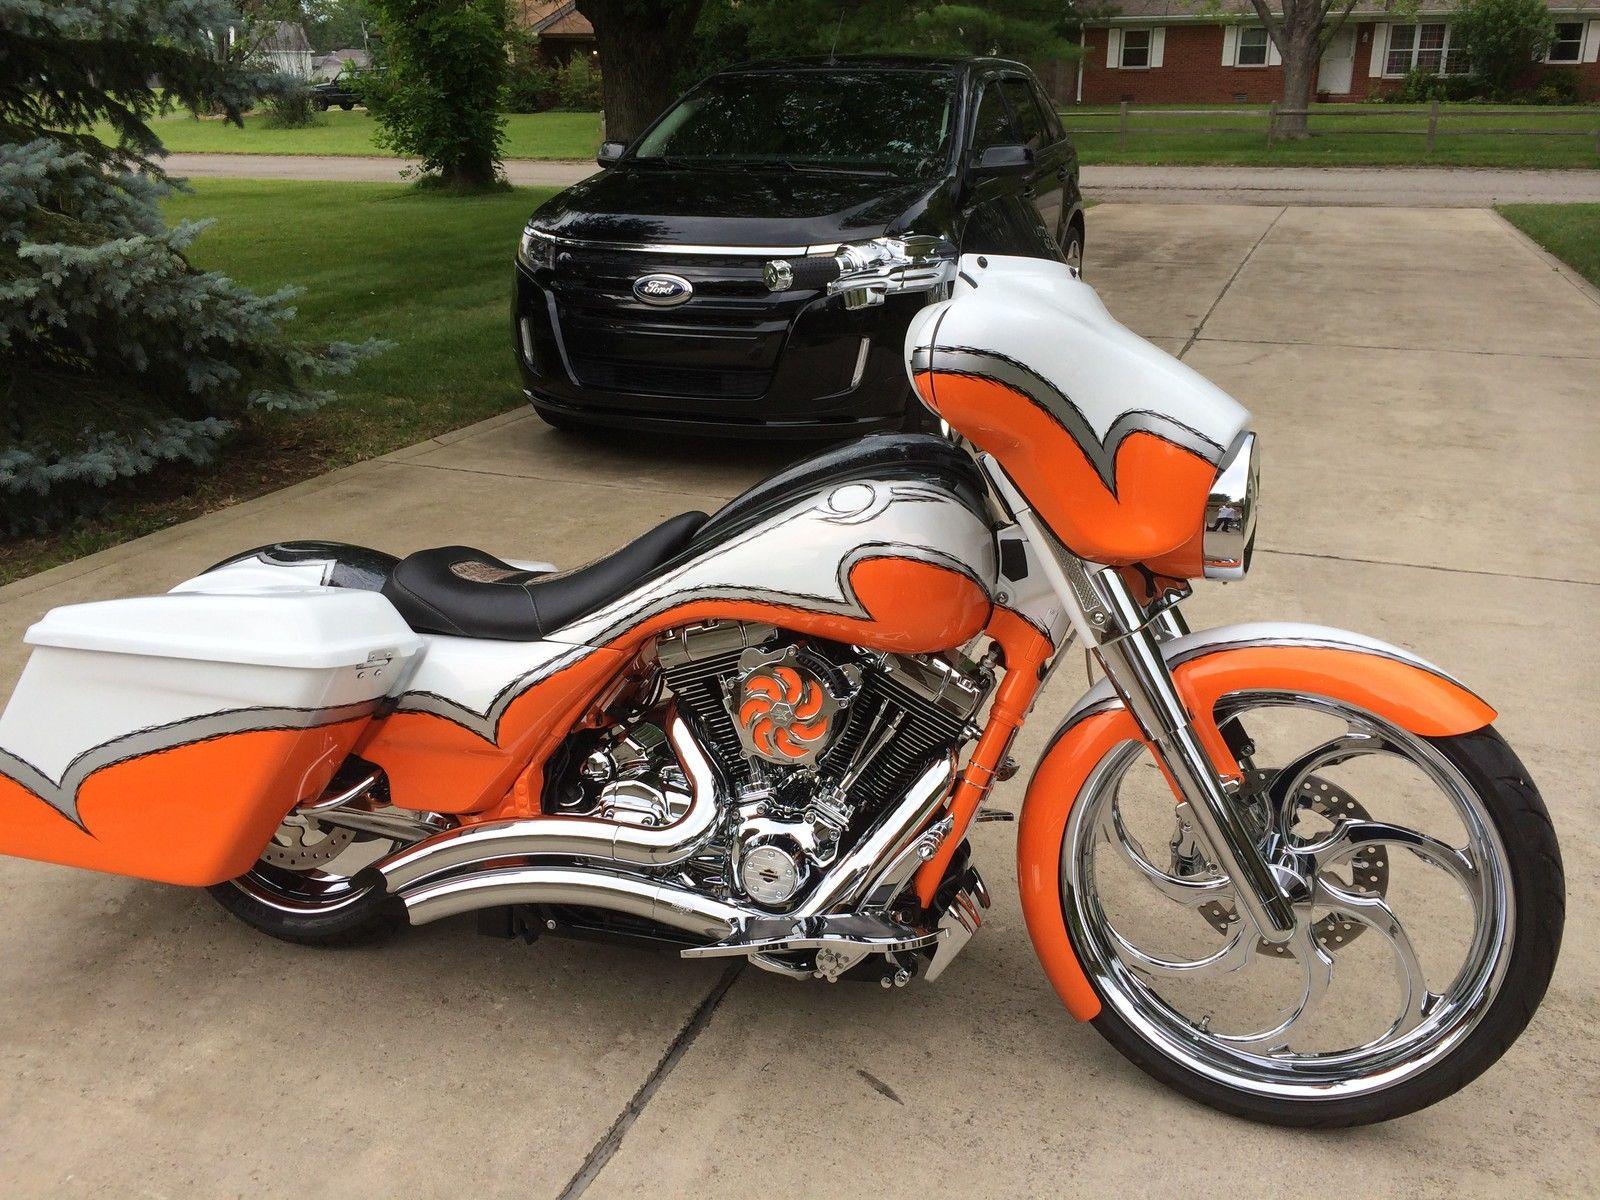 2012 Harley Davidson Street Glide -23